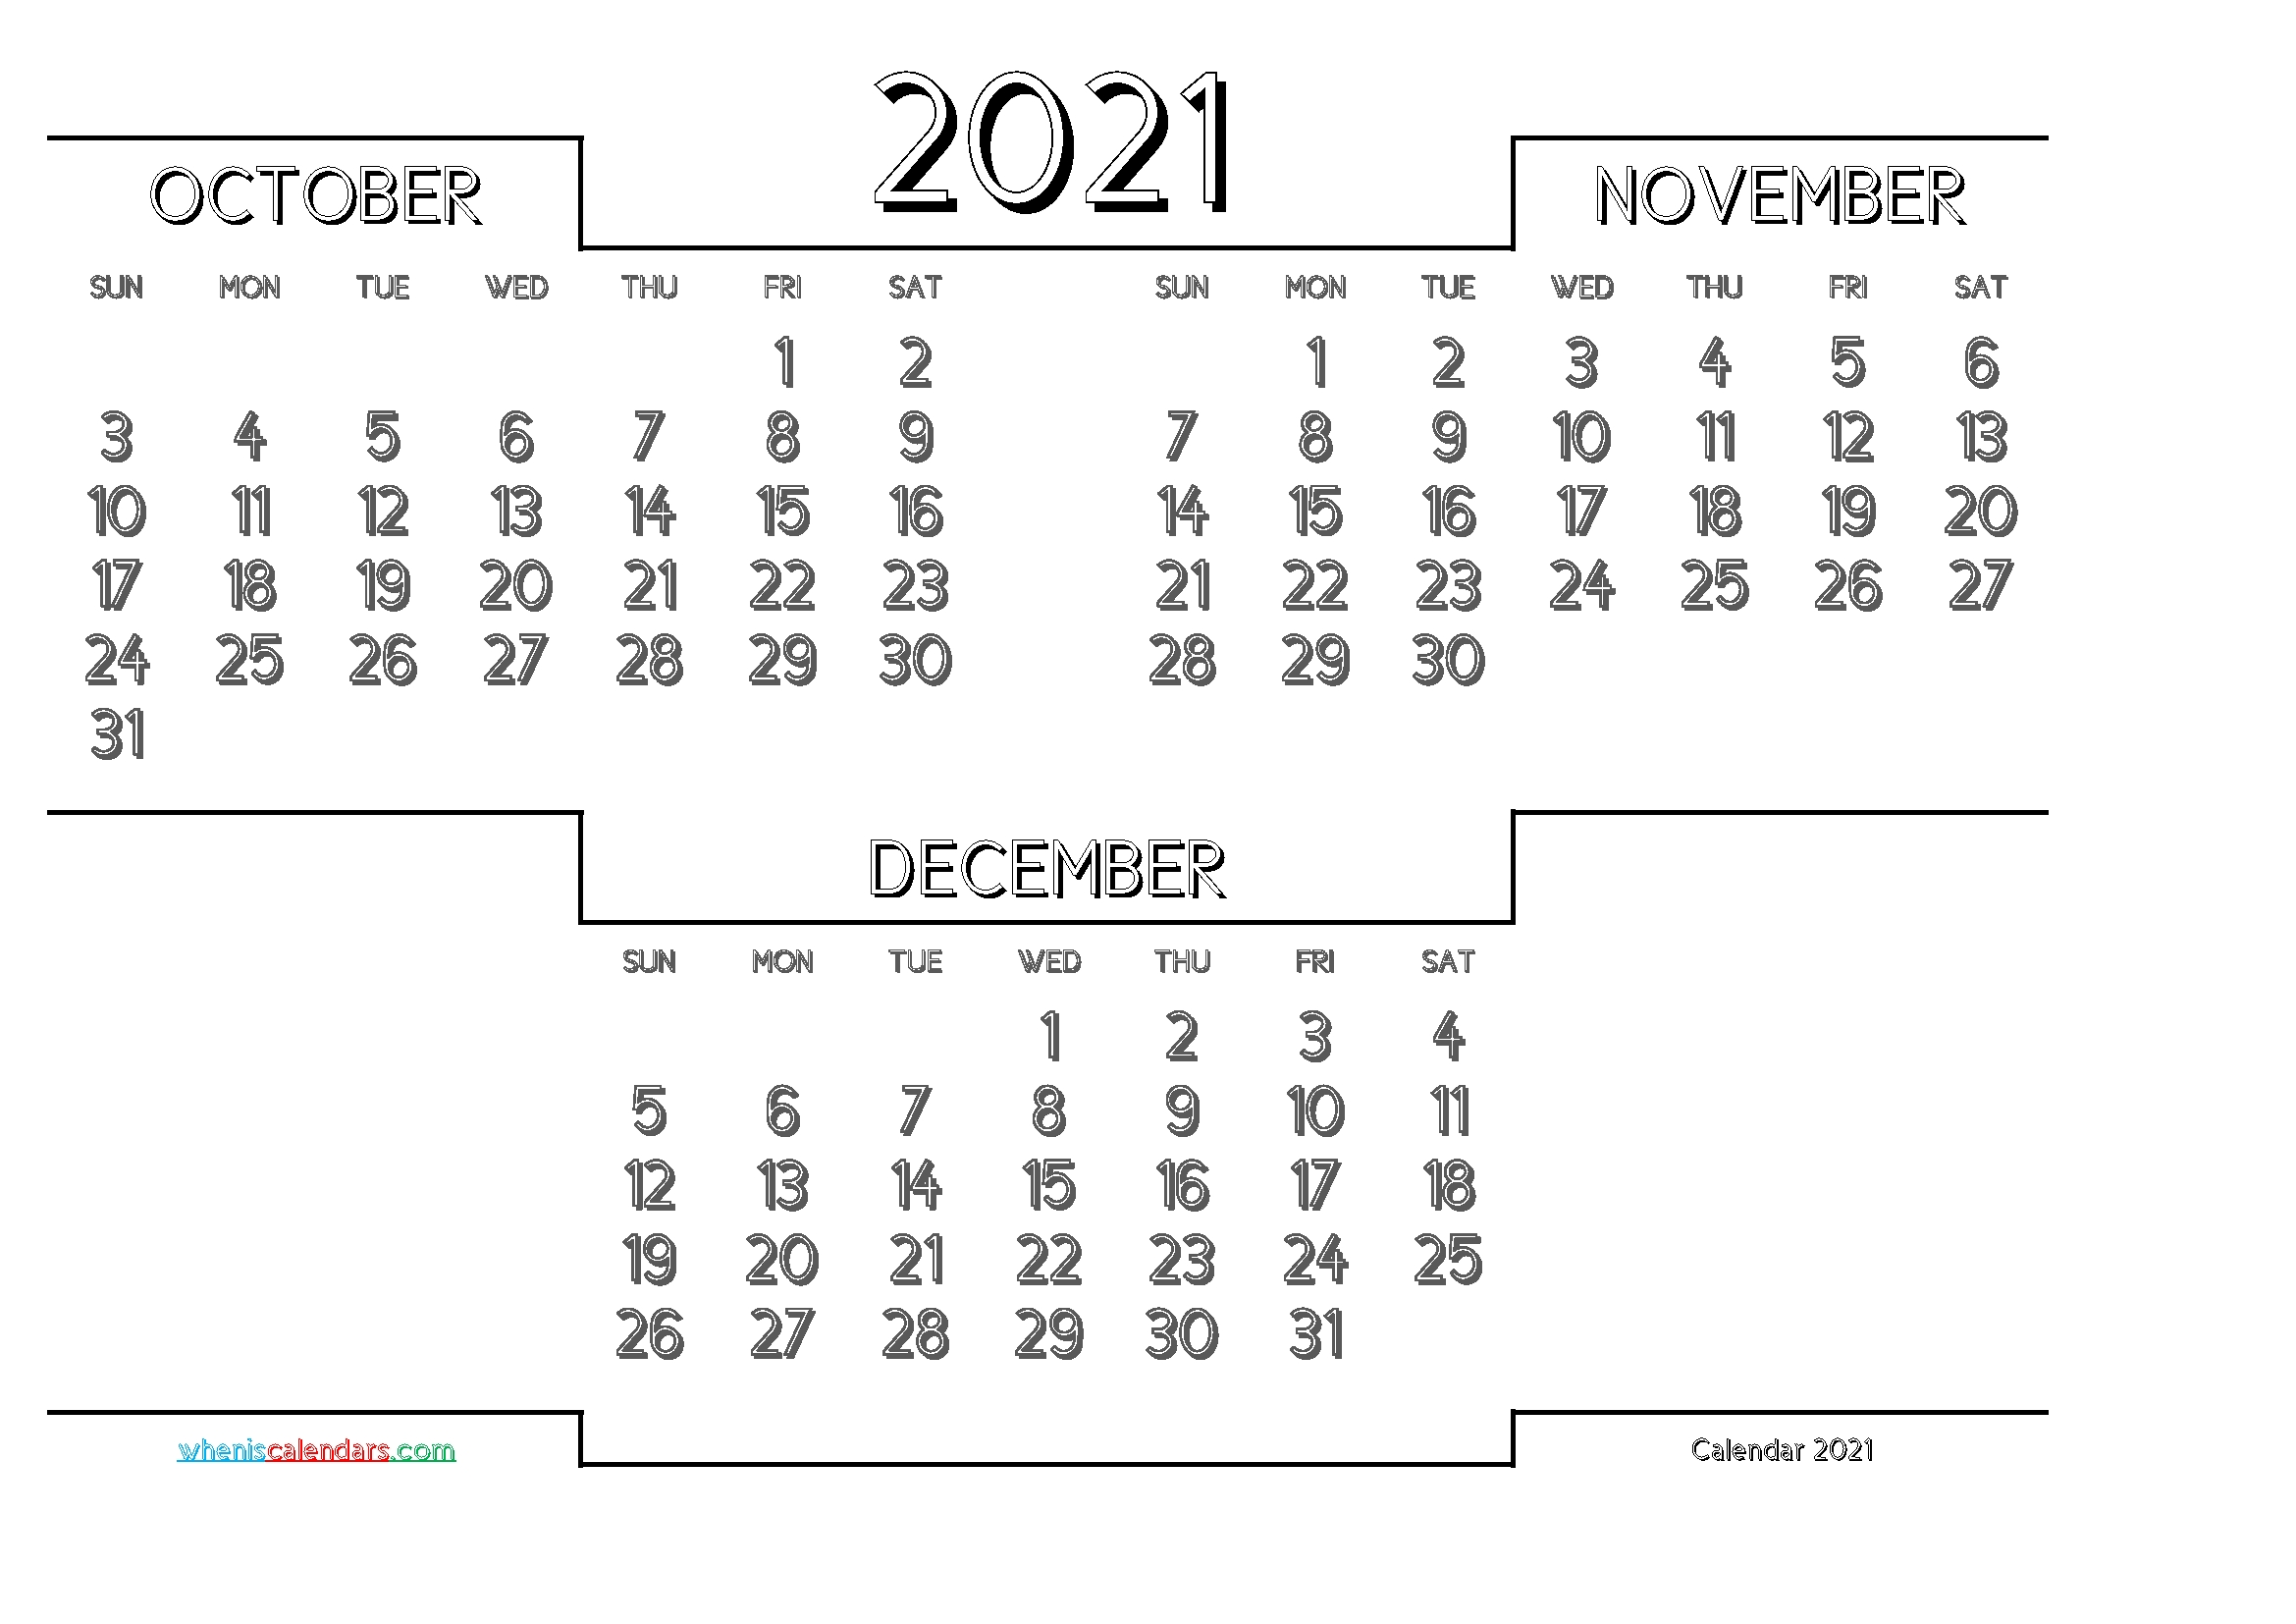 October November December 2021 Printable Calendar Free - Free Printable 2021 Monthly Calendar October November December 2021 Calendar